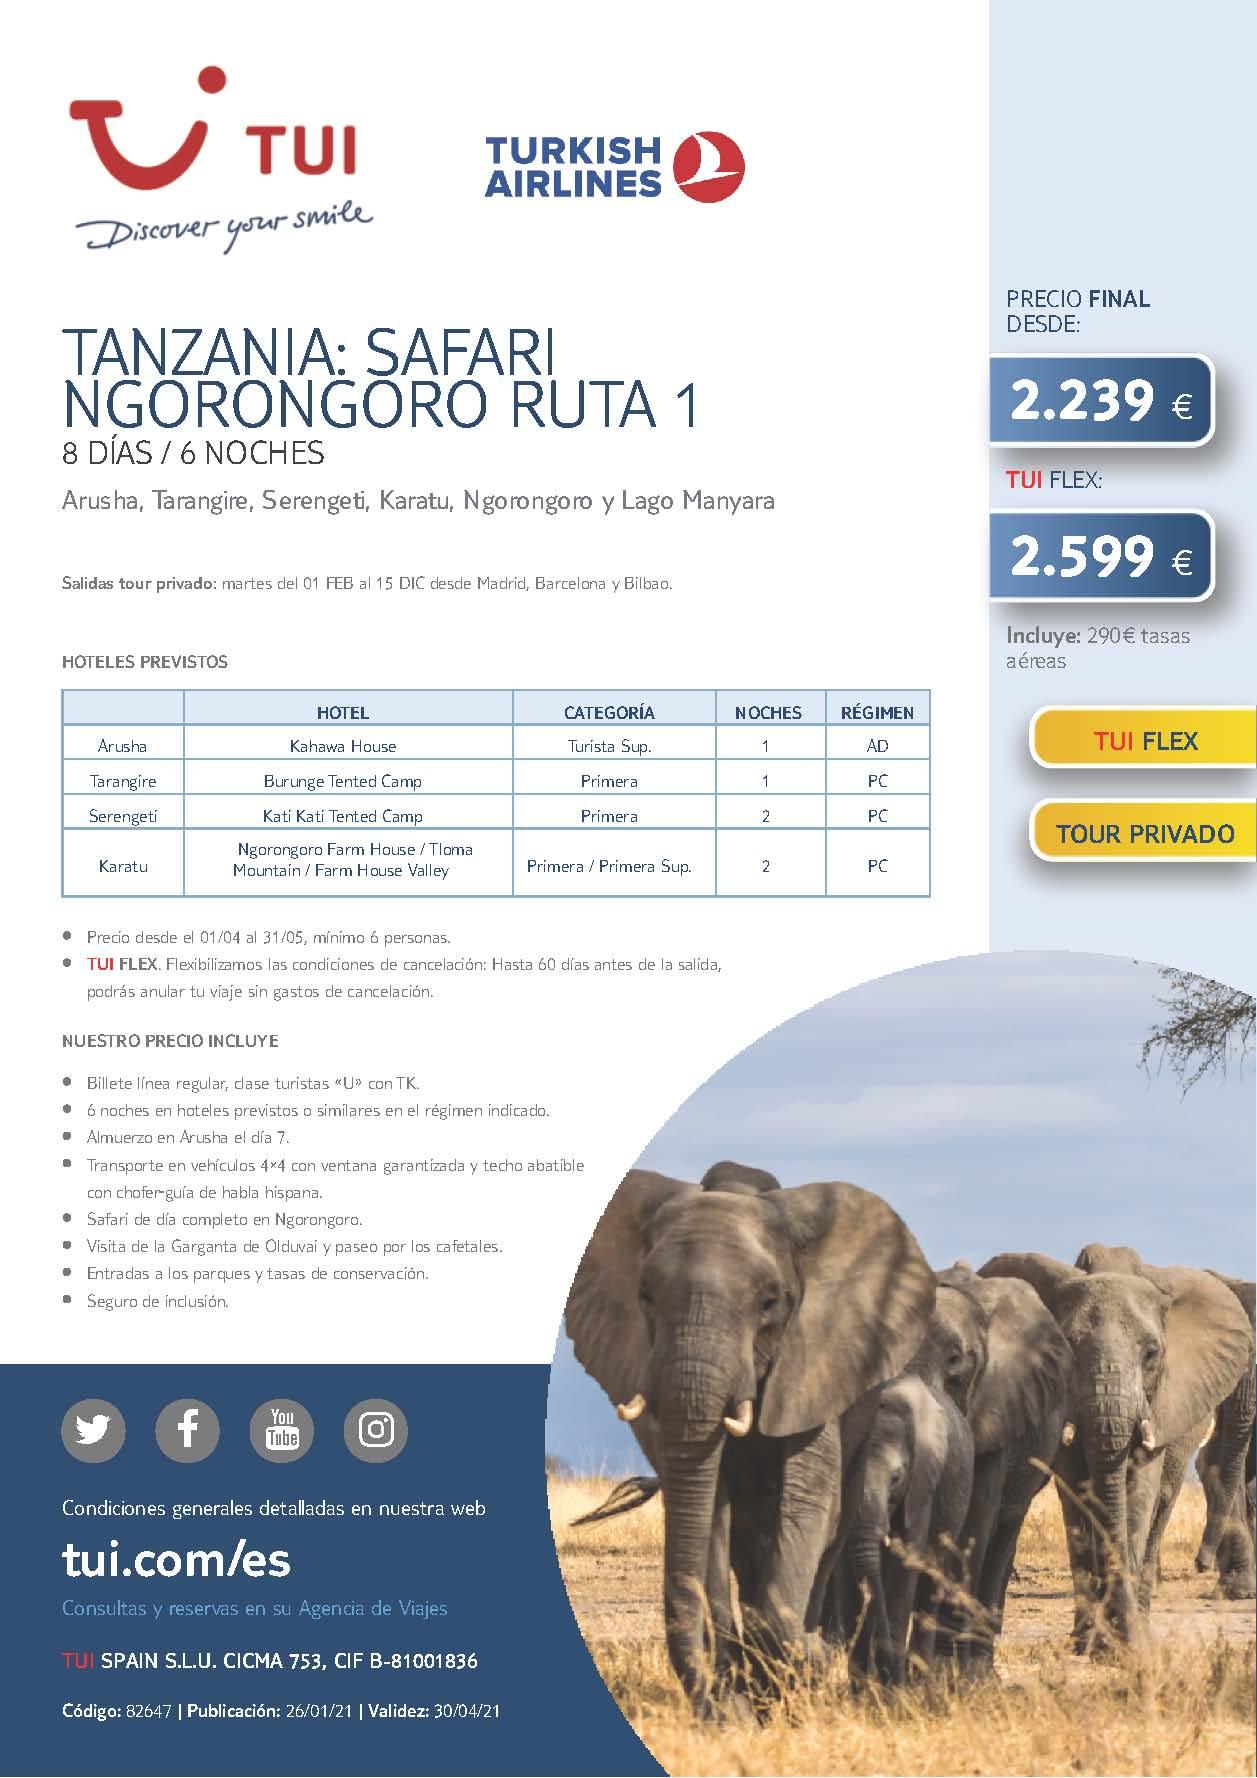 Oferta TUI Verano 2021 Tanzania Safari Ngorongoro Ruta 1